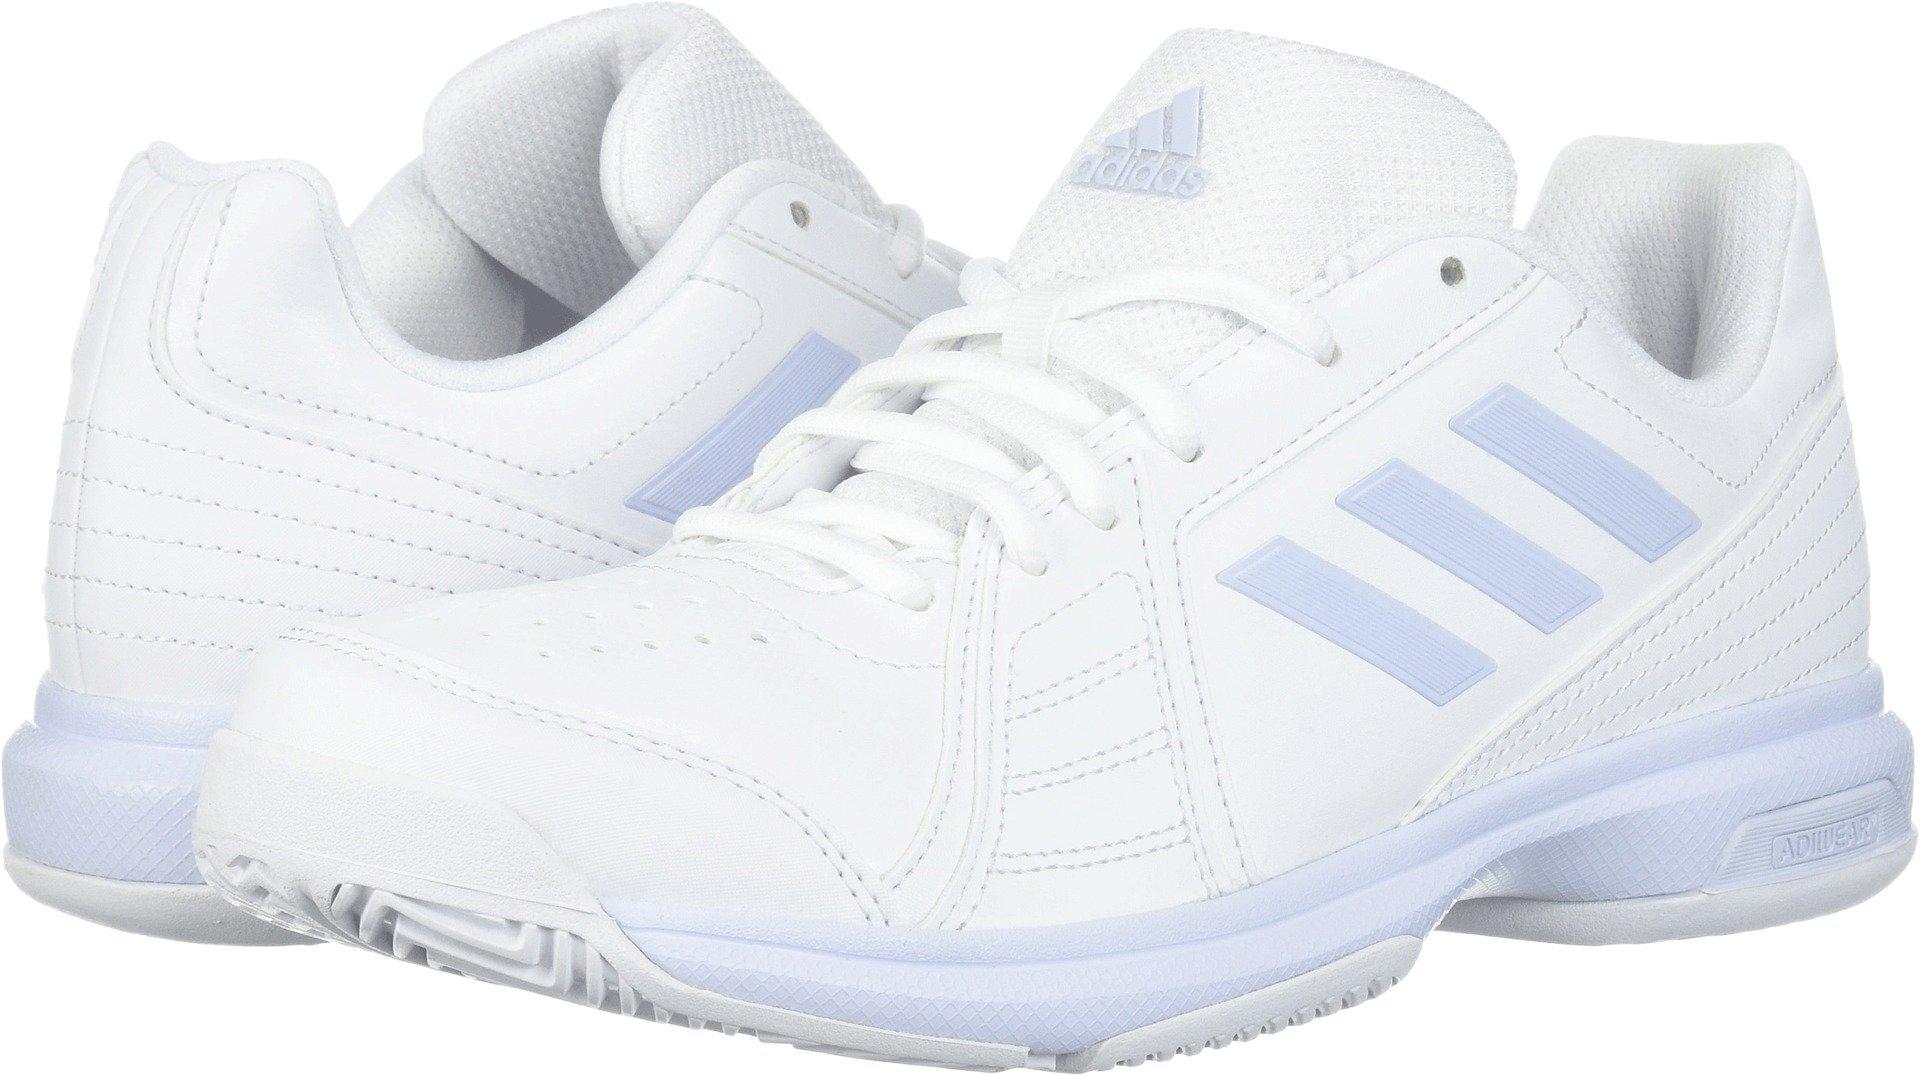 adidas  Women's Aspire Tennis Shoe, White/Aero Blue/White, 7.5 M US by adidas (Image #1)